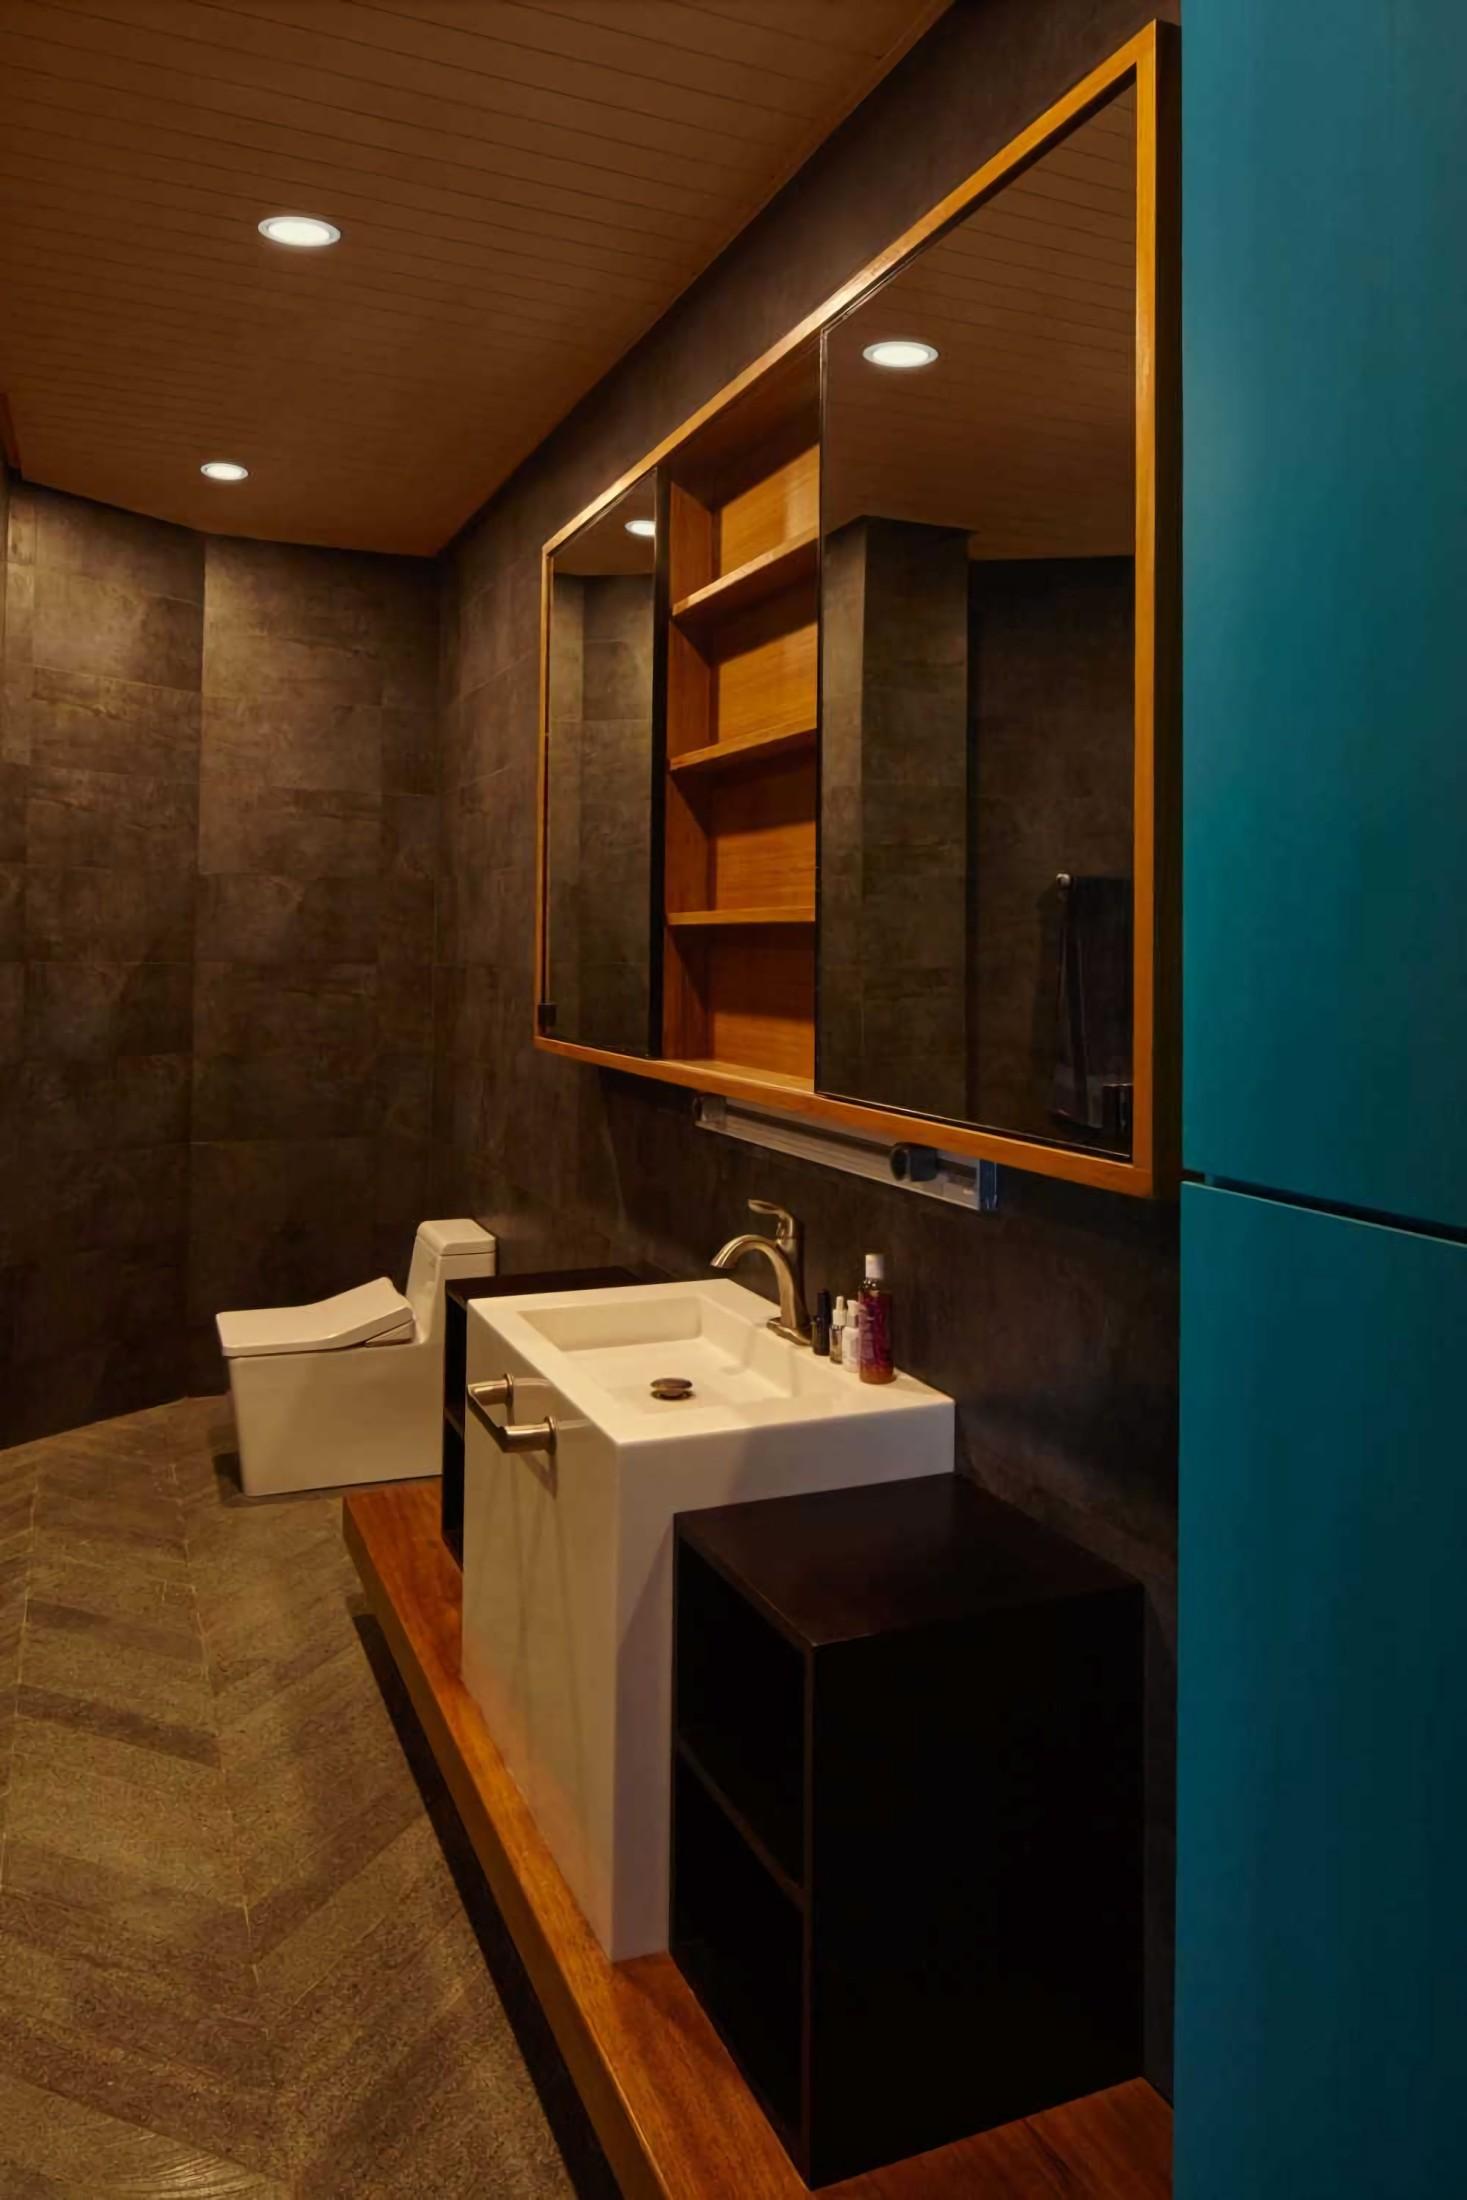 Tata pencahayaan downlightning pada plafon kayu model drop ceiling menerangi kamar mandi Na Residence, memantulkan warna gelap dari keramik dinding dengan lembut dan warna turquoise yang elegan.